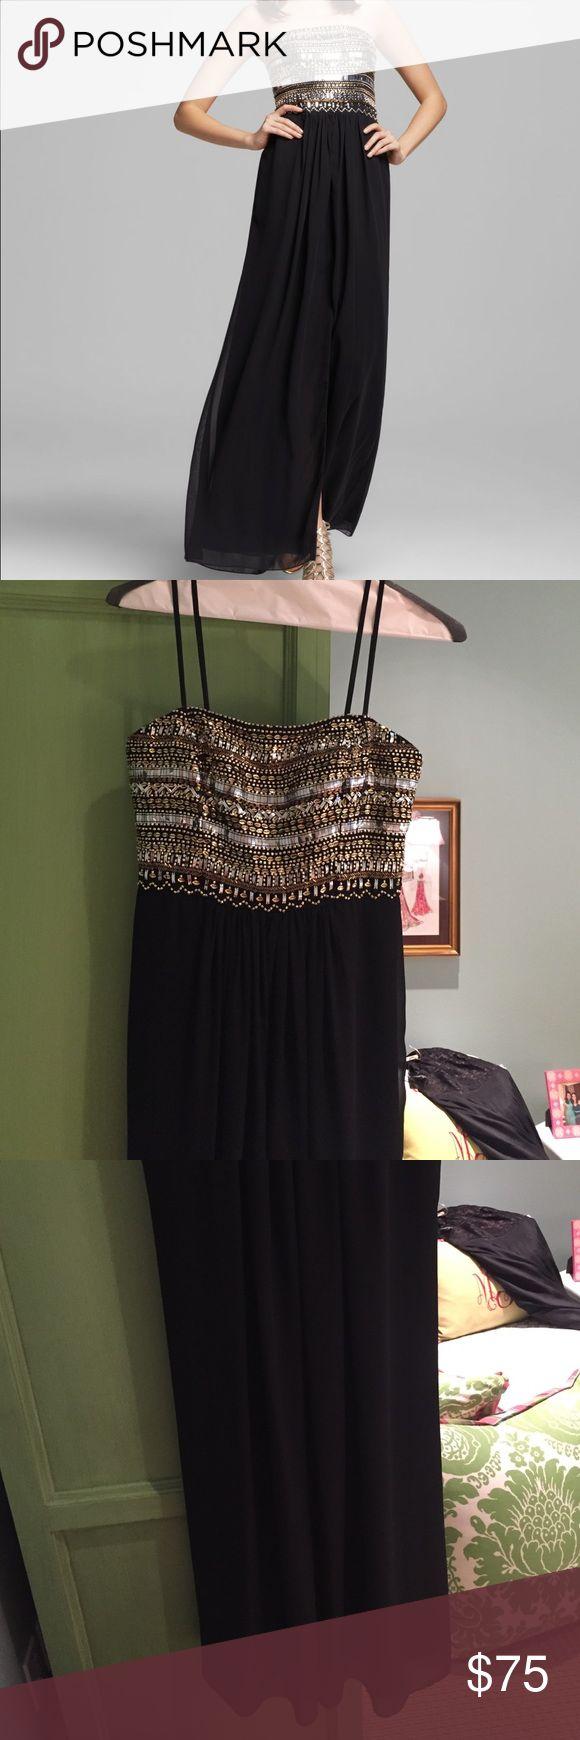 Aidan Mattox Beaded Black Chiffon Strapless Gown Aidan Mattox Beaded Chiffon Gown / WORN ONCE Aidan Mattox Dresses